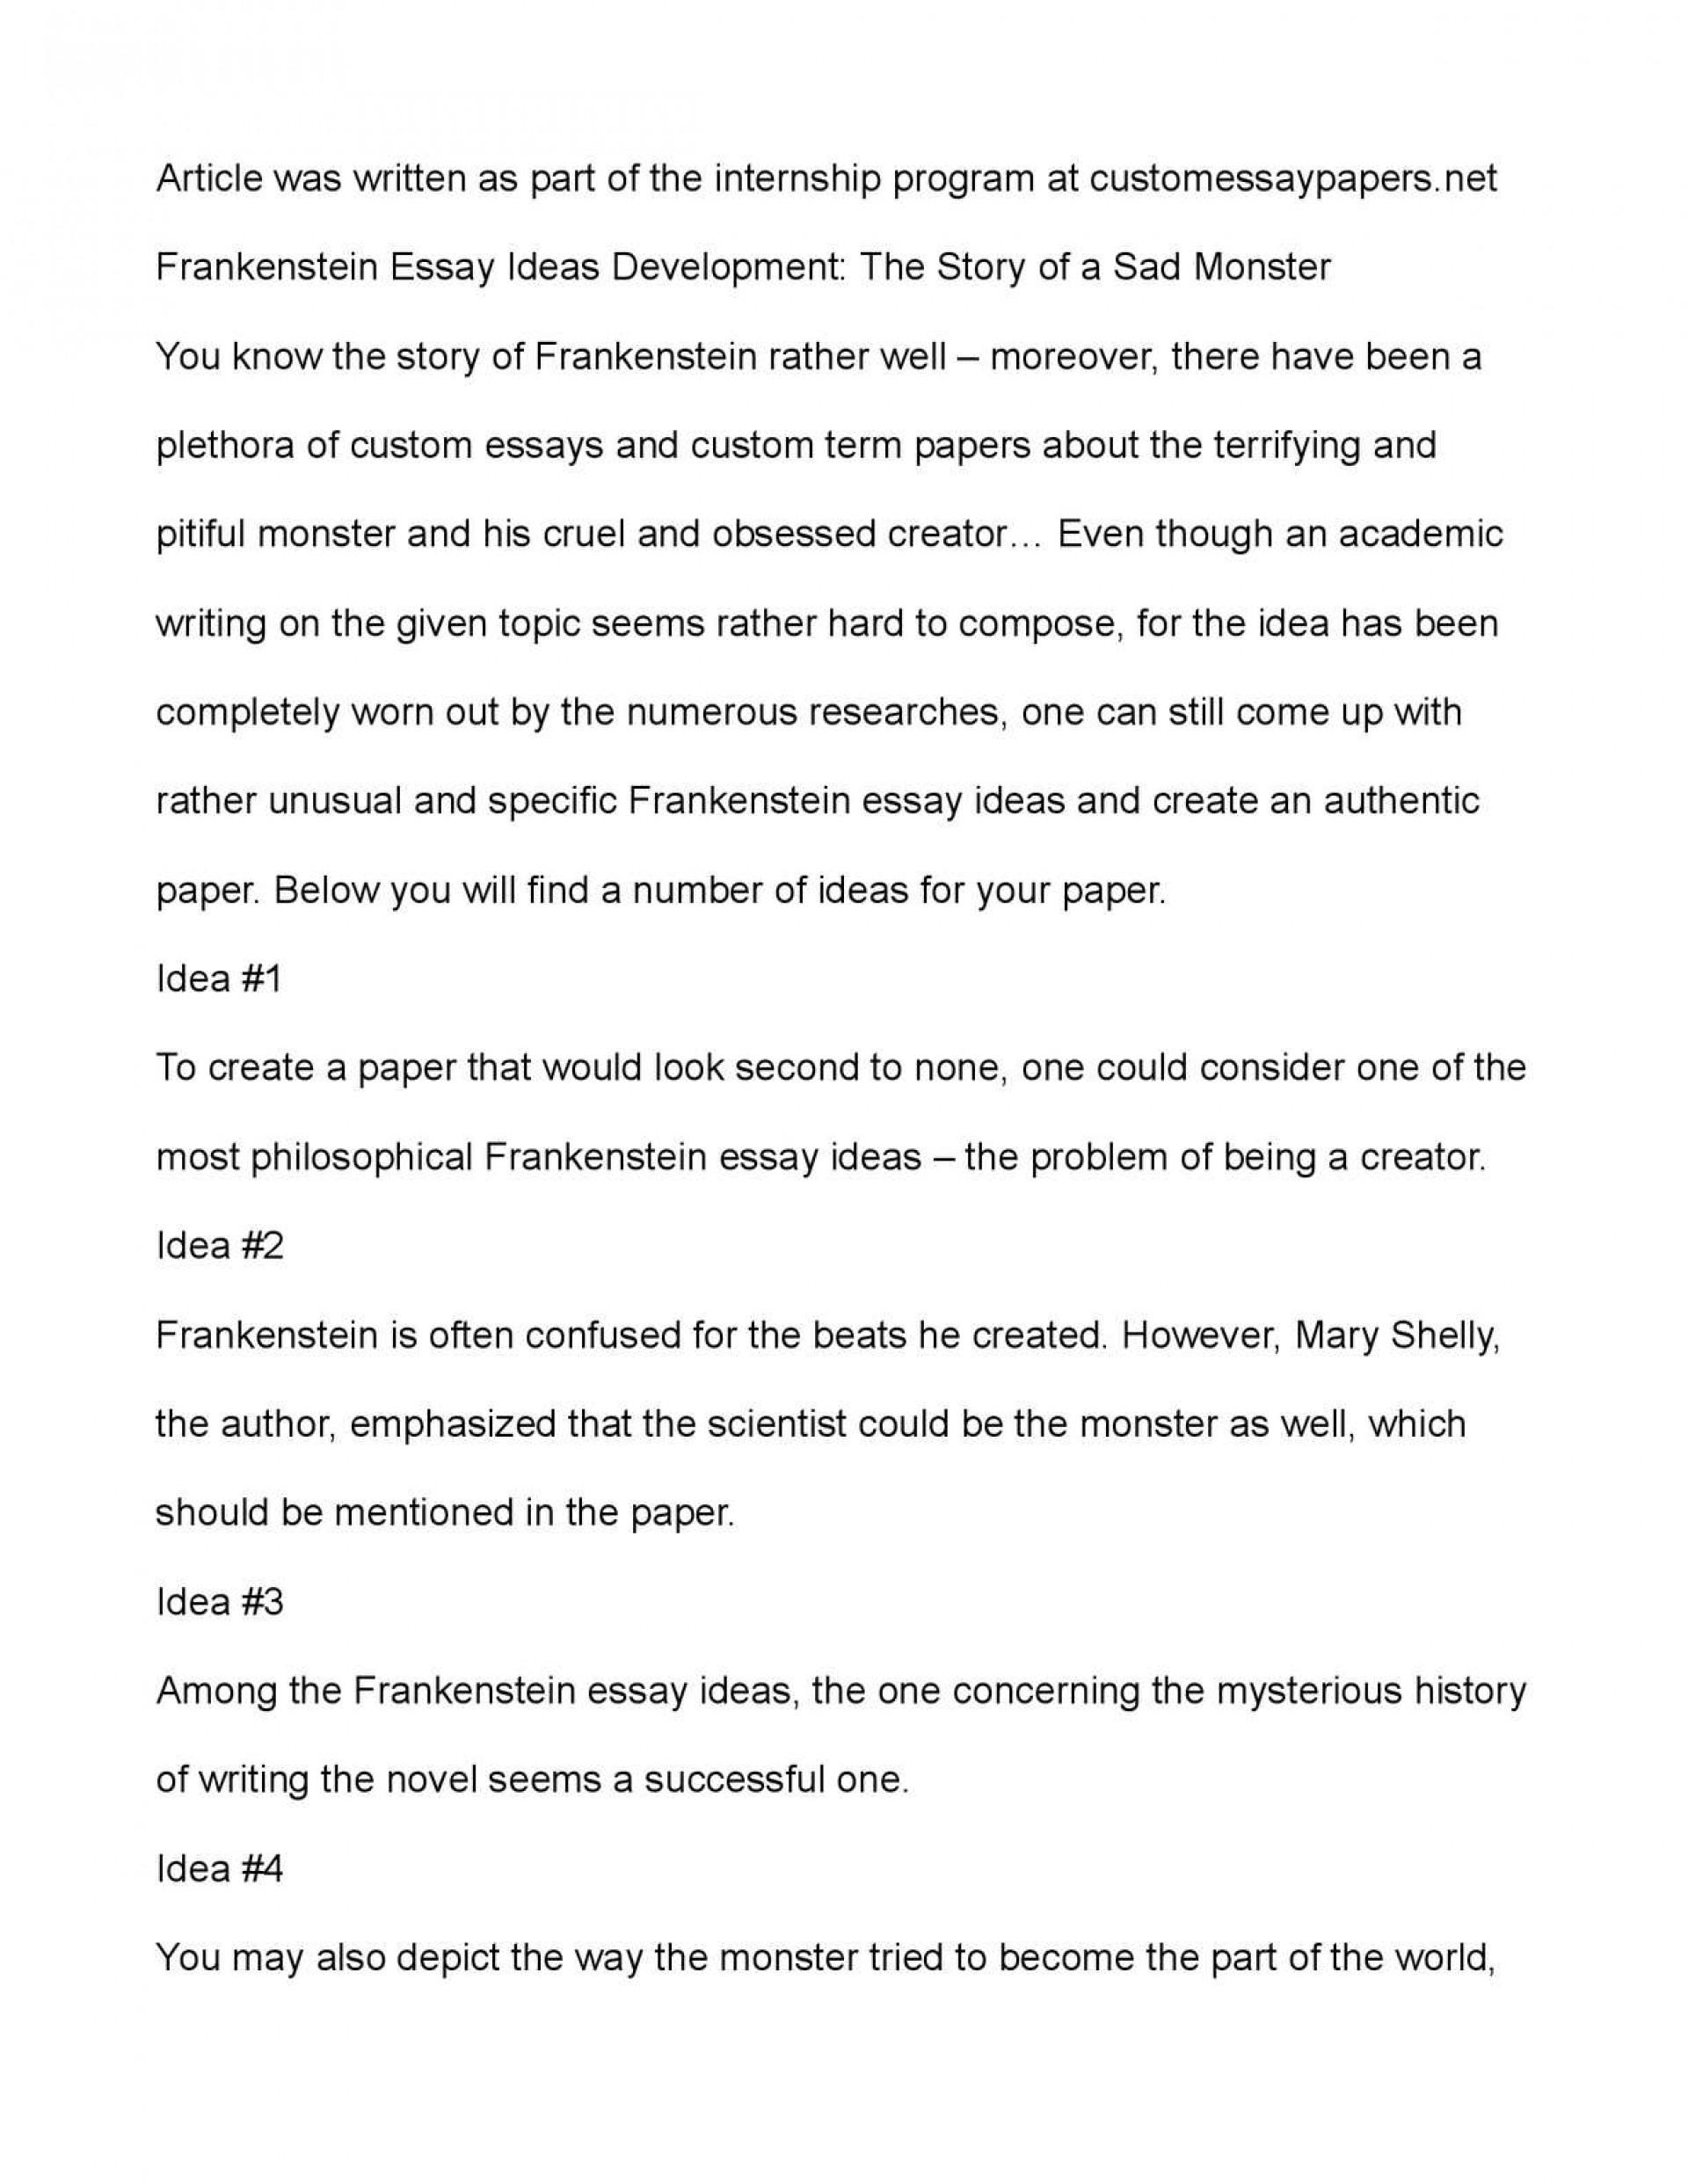 003 Frankenstein Essay Example Breathtaking Prompts Argumentative Topics 1920